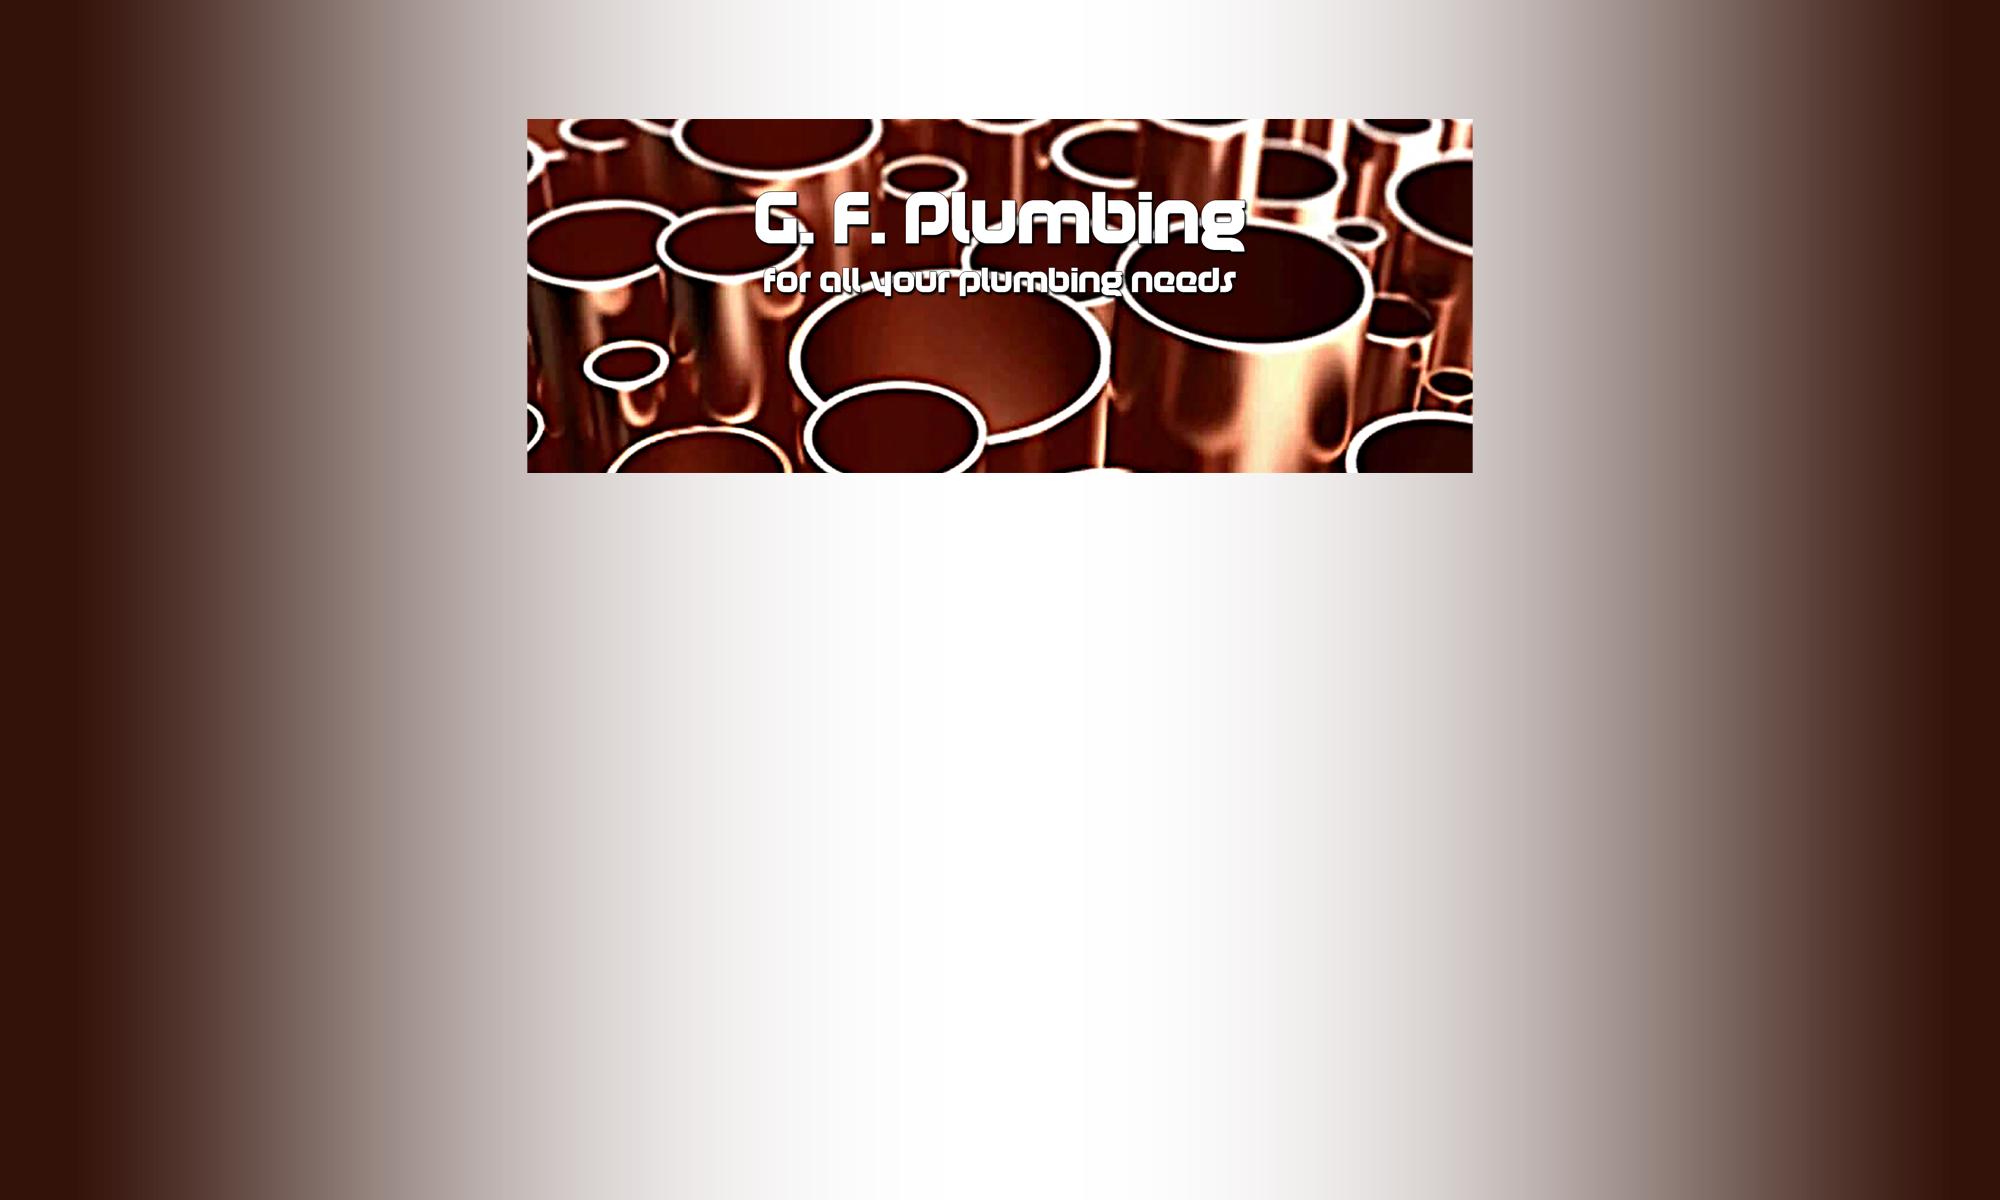 G.F. Plumbing